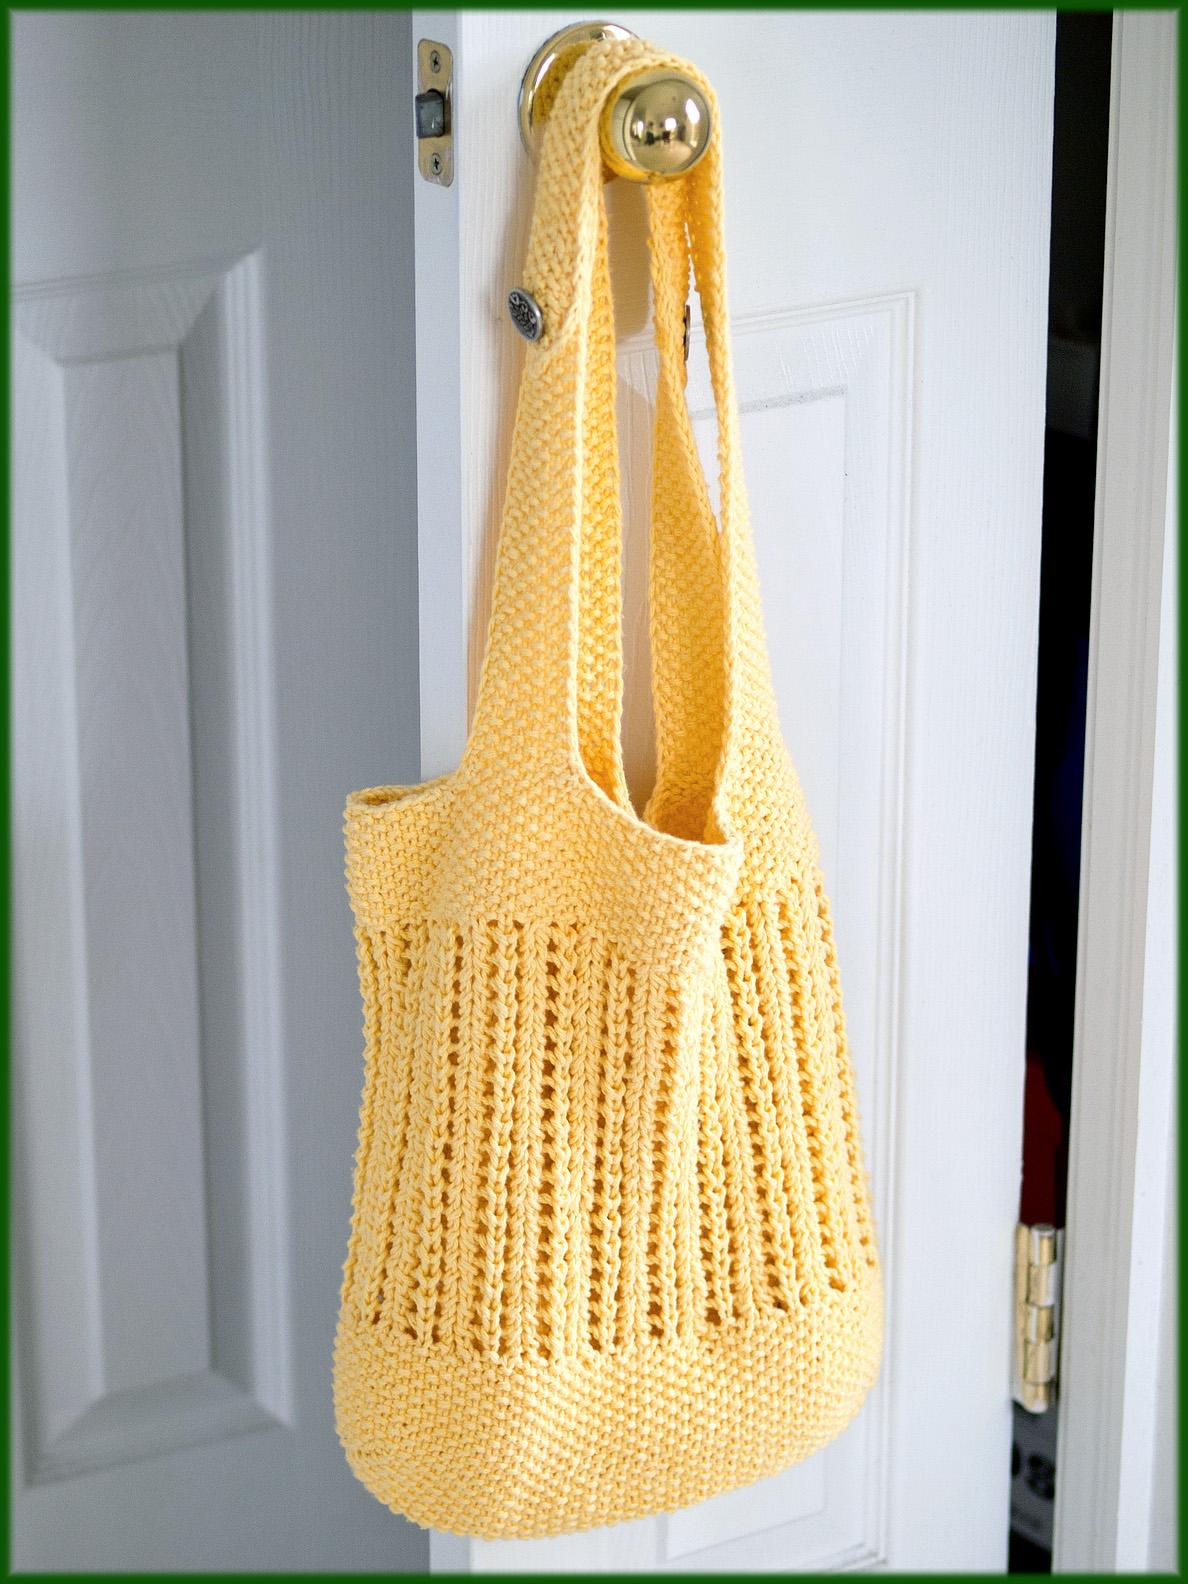 Wyndlestraw Designs: Market Bag Knit-along #7 - Handles ...